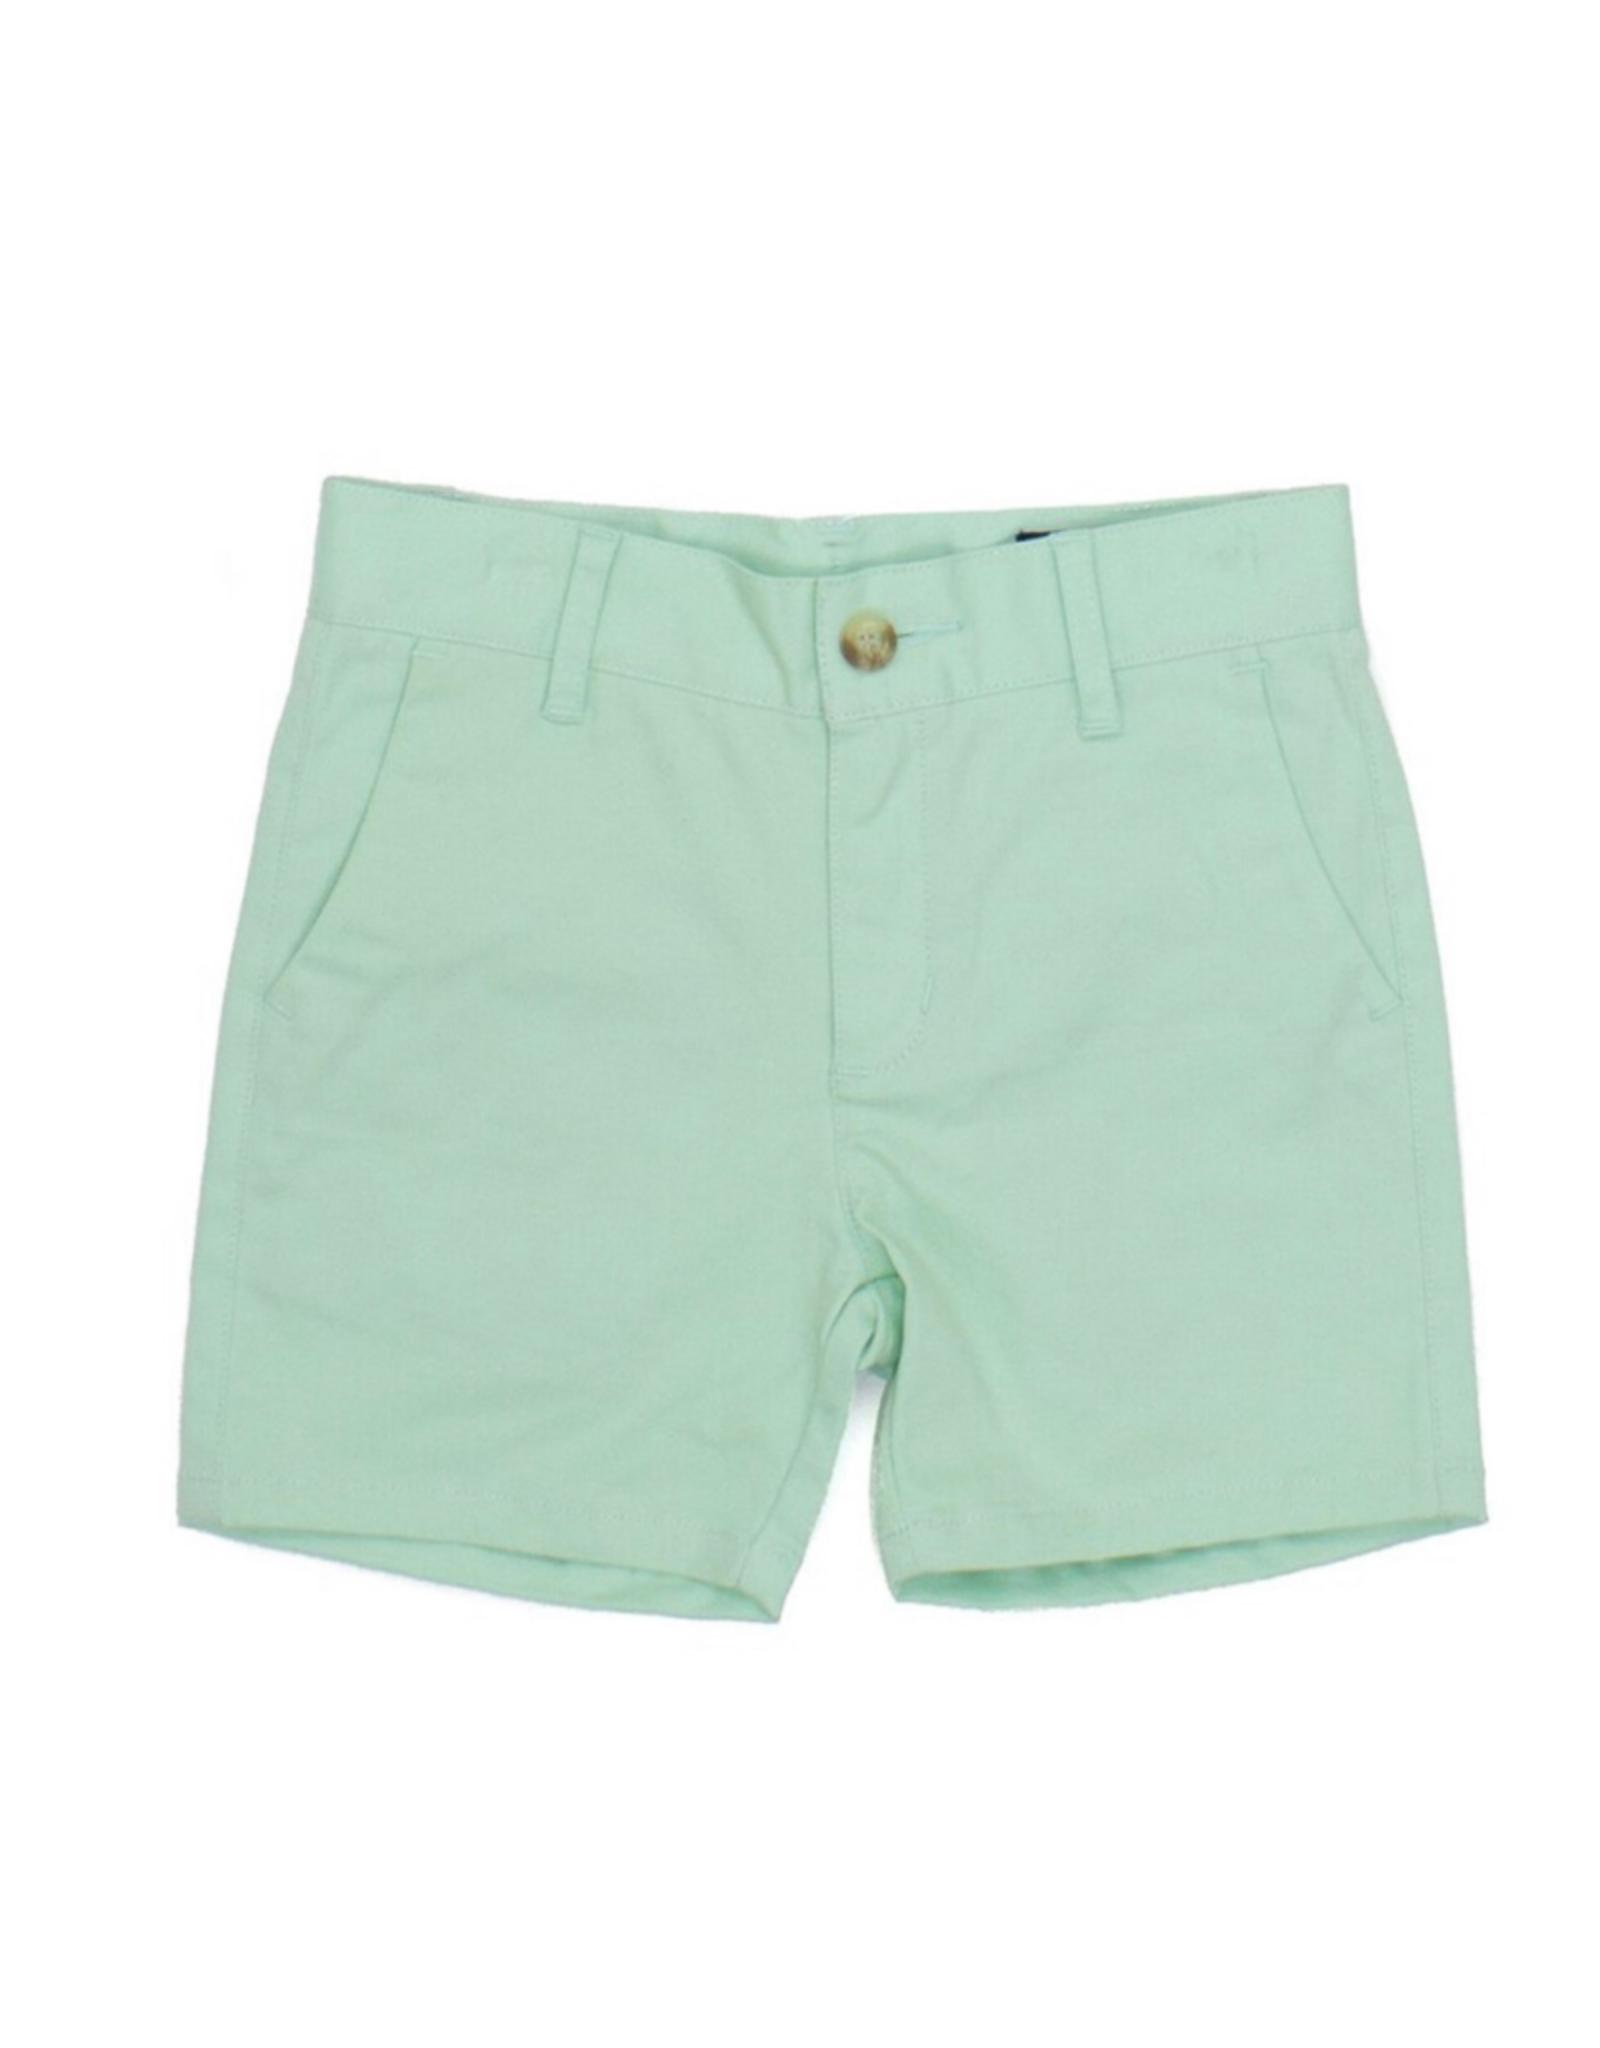 Properly Tied Seafoam Club Shorts